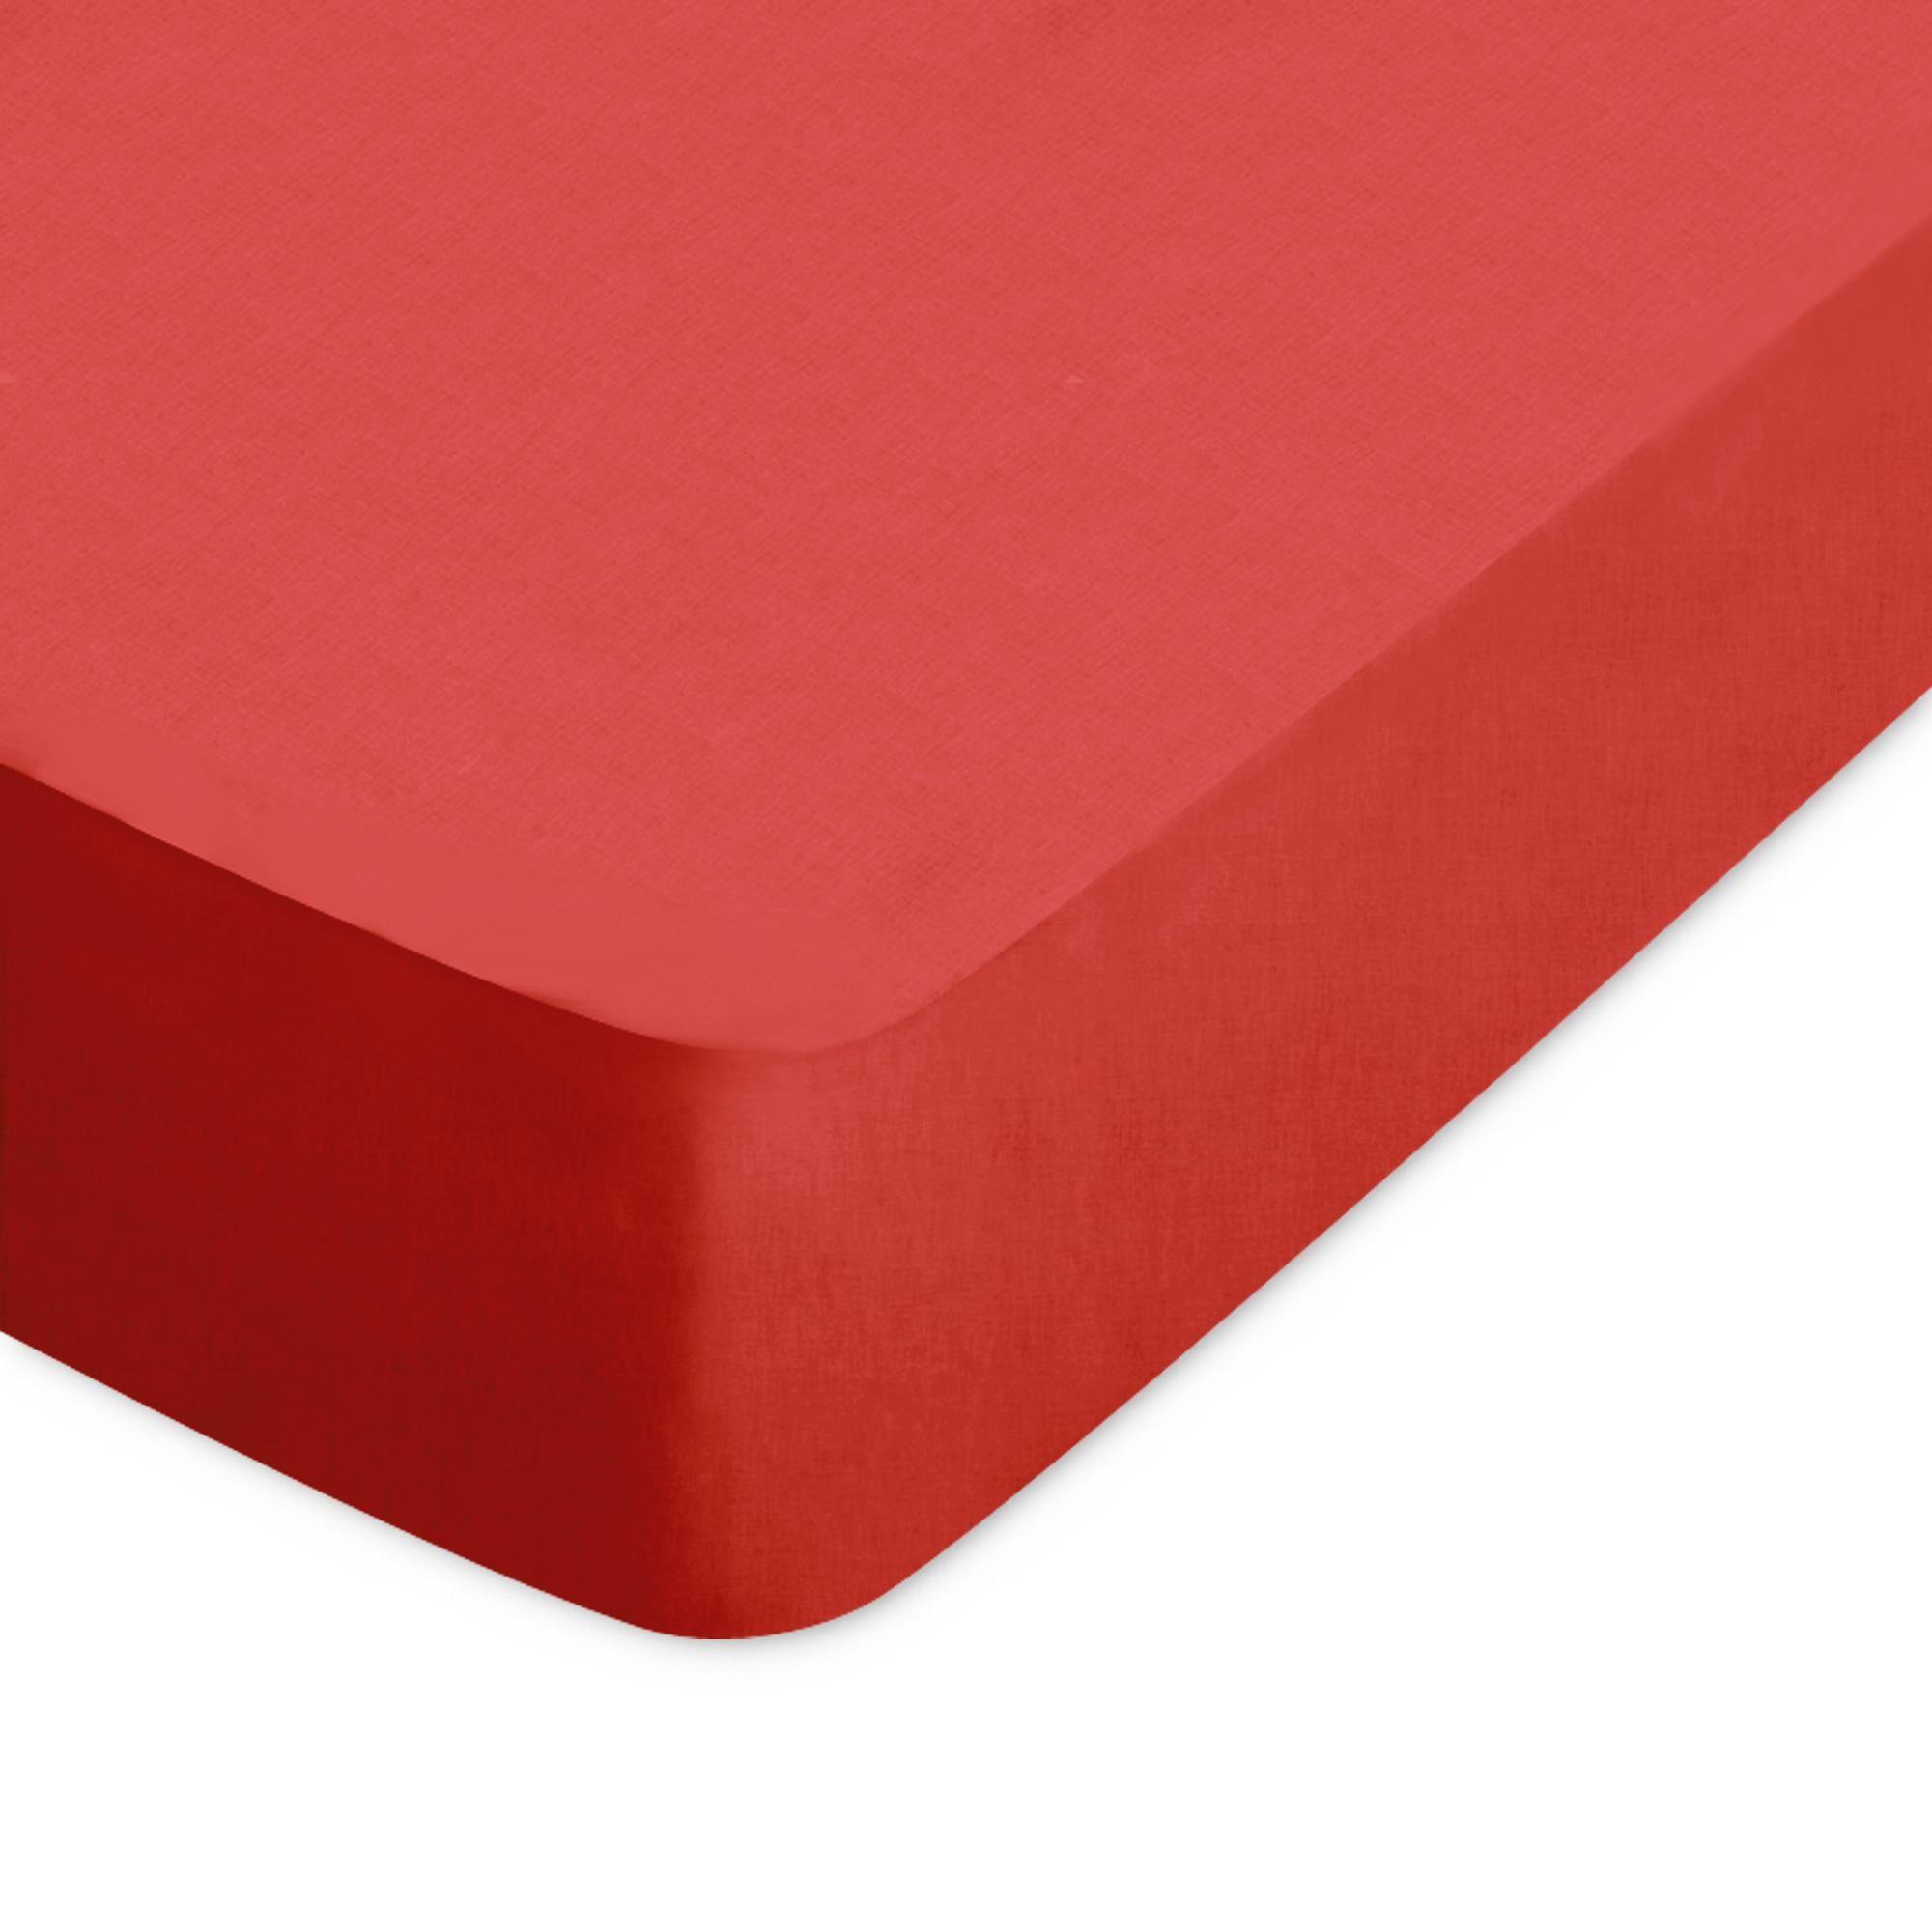 Linnea Drap housse uni 110x190 cm 100% coton ALTO orange Baie de Goji